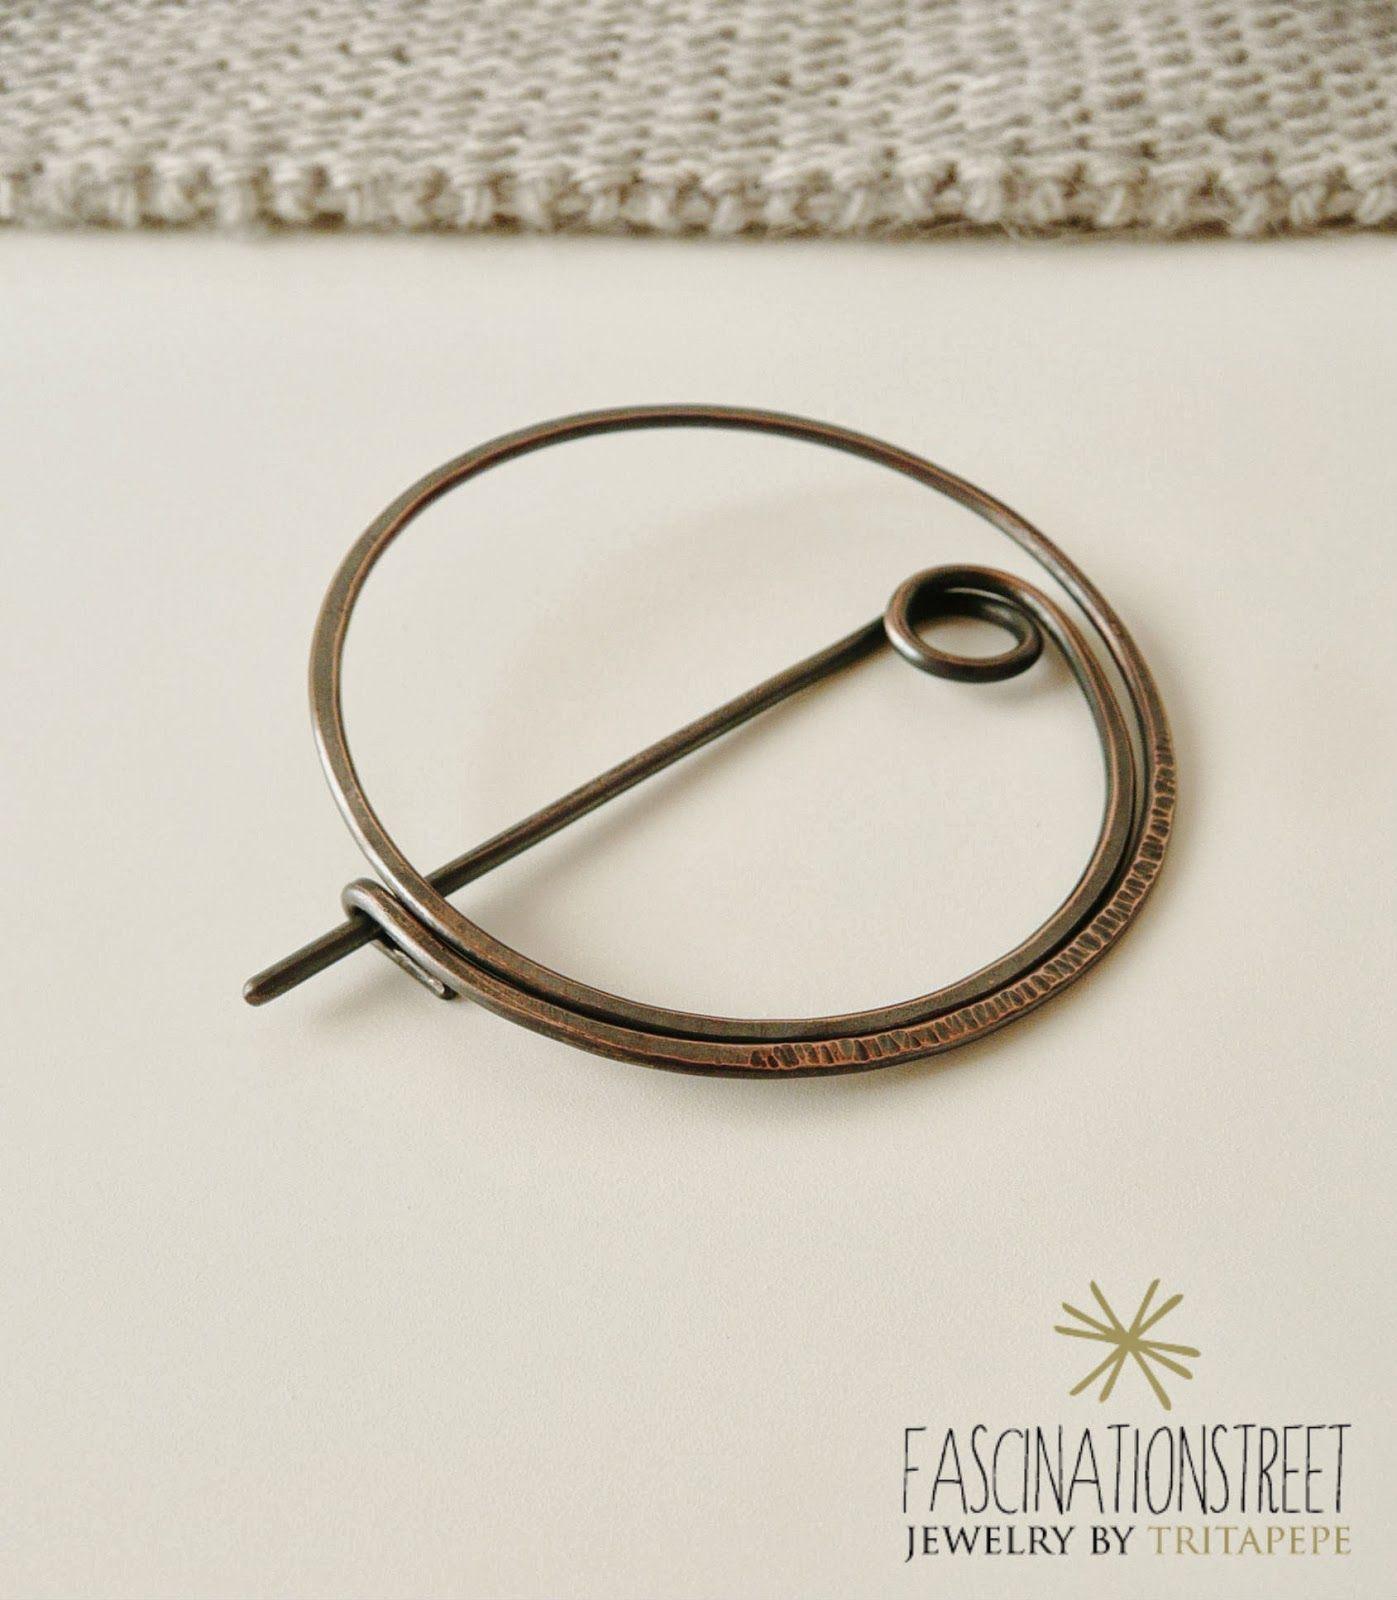 Fascinationstreet B-handmade: Fibel - spilla/fibula in rame e ...